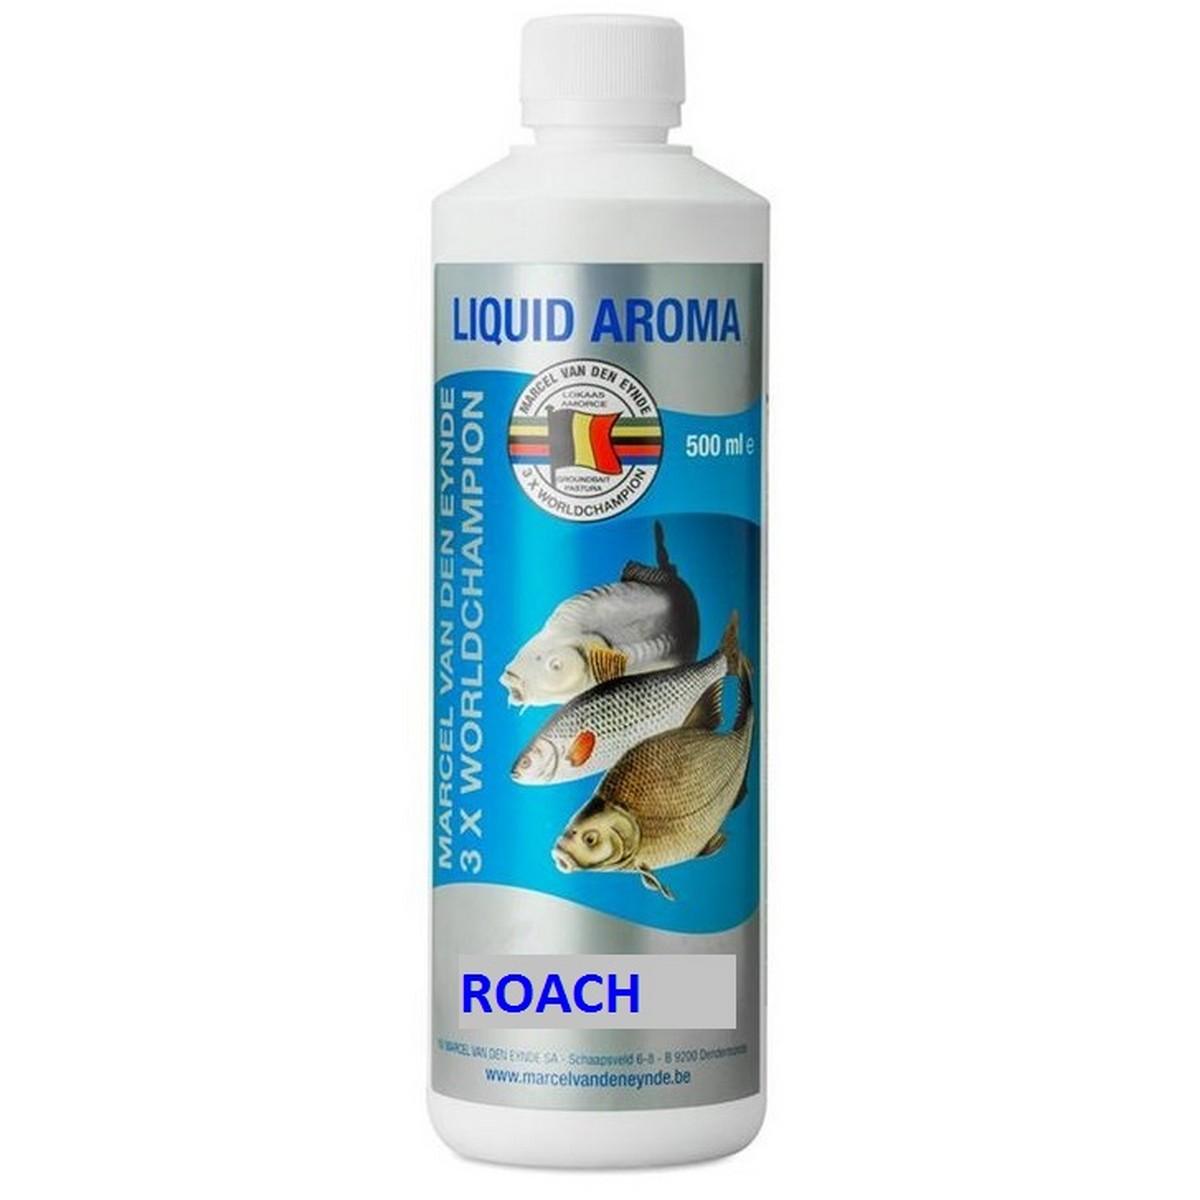 Liquid Aroma Van Den Eynde Roach(Червеноперка) 500ml